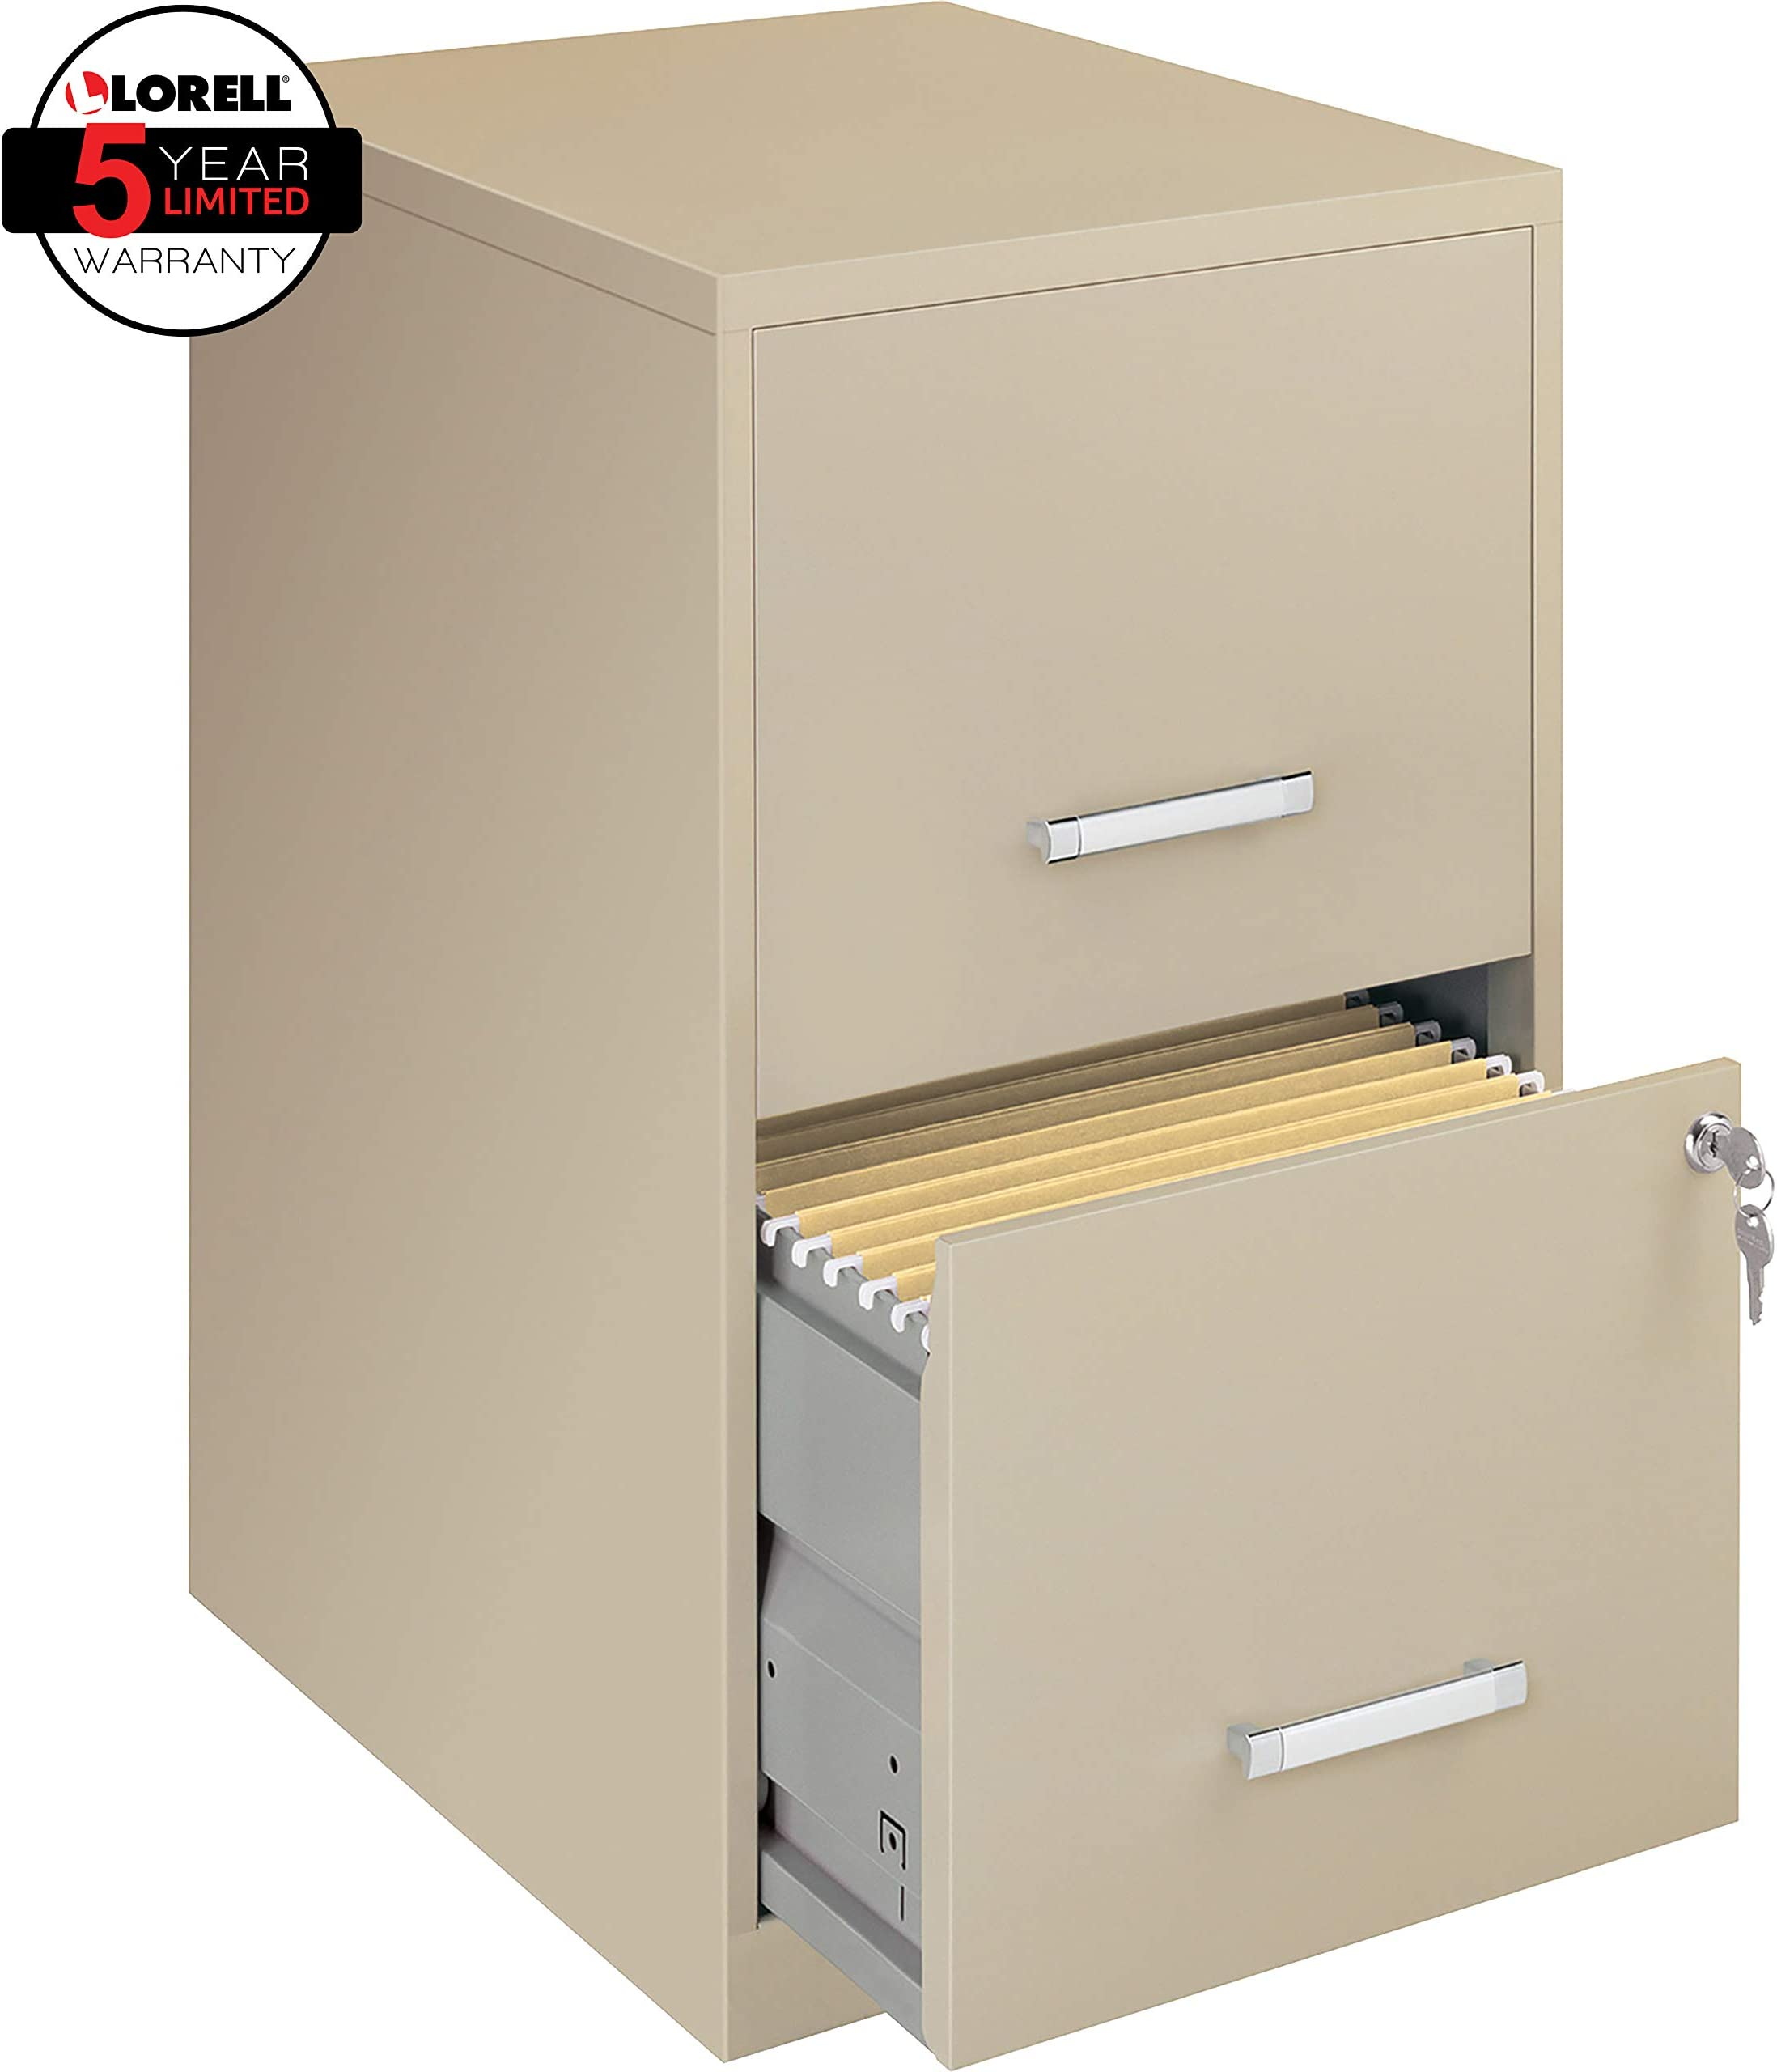 office file cabinets shop amazon com rh amazon com office file cabinets with locks filing cabinets with lock ikea